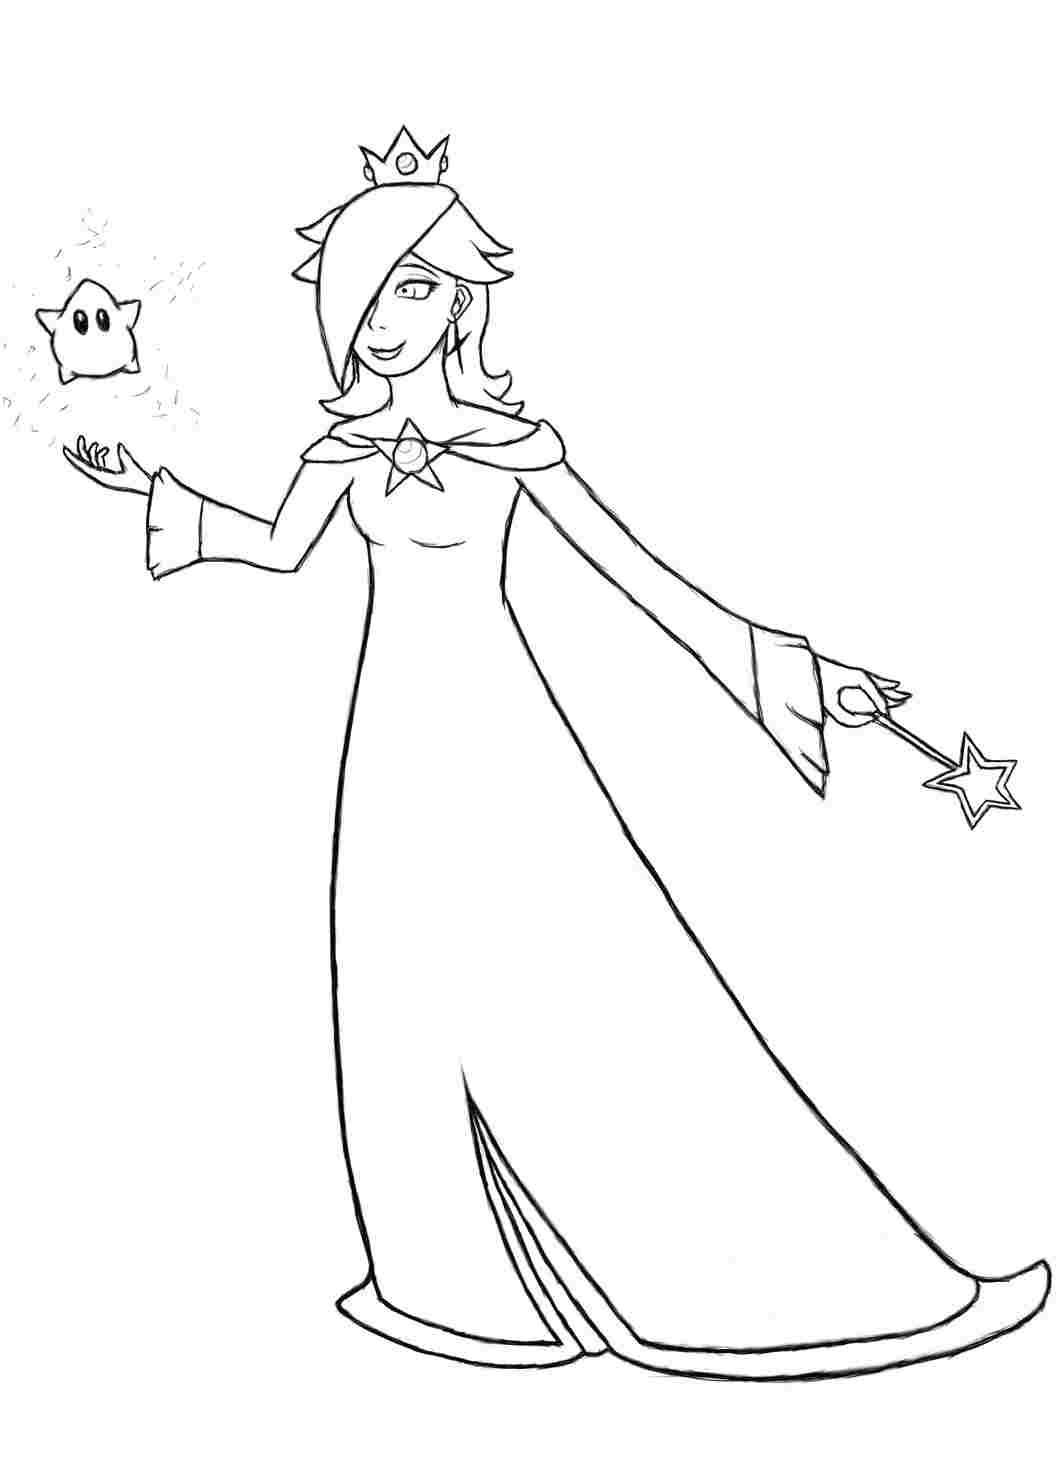 Rosalina and star in Super Mario Bros Coloring Page